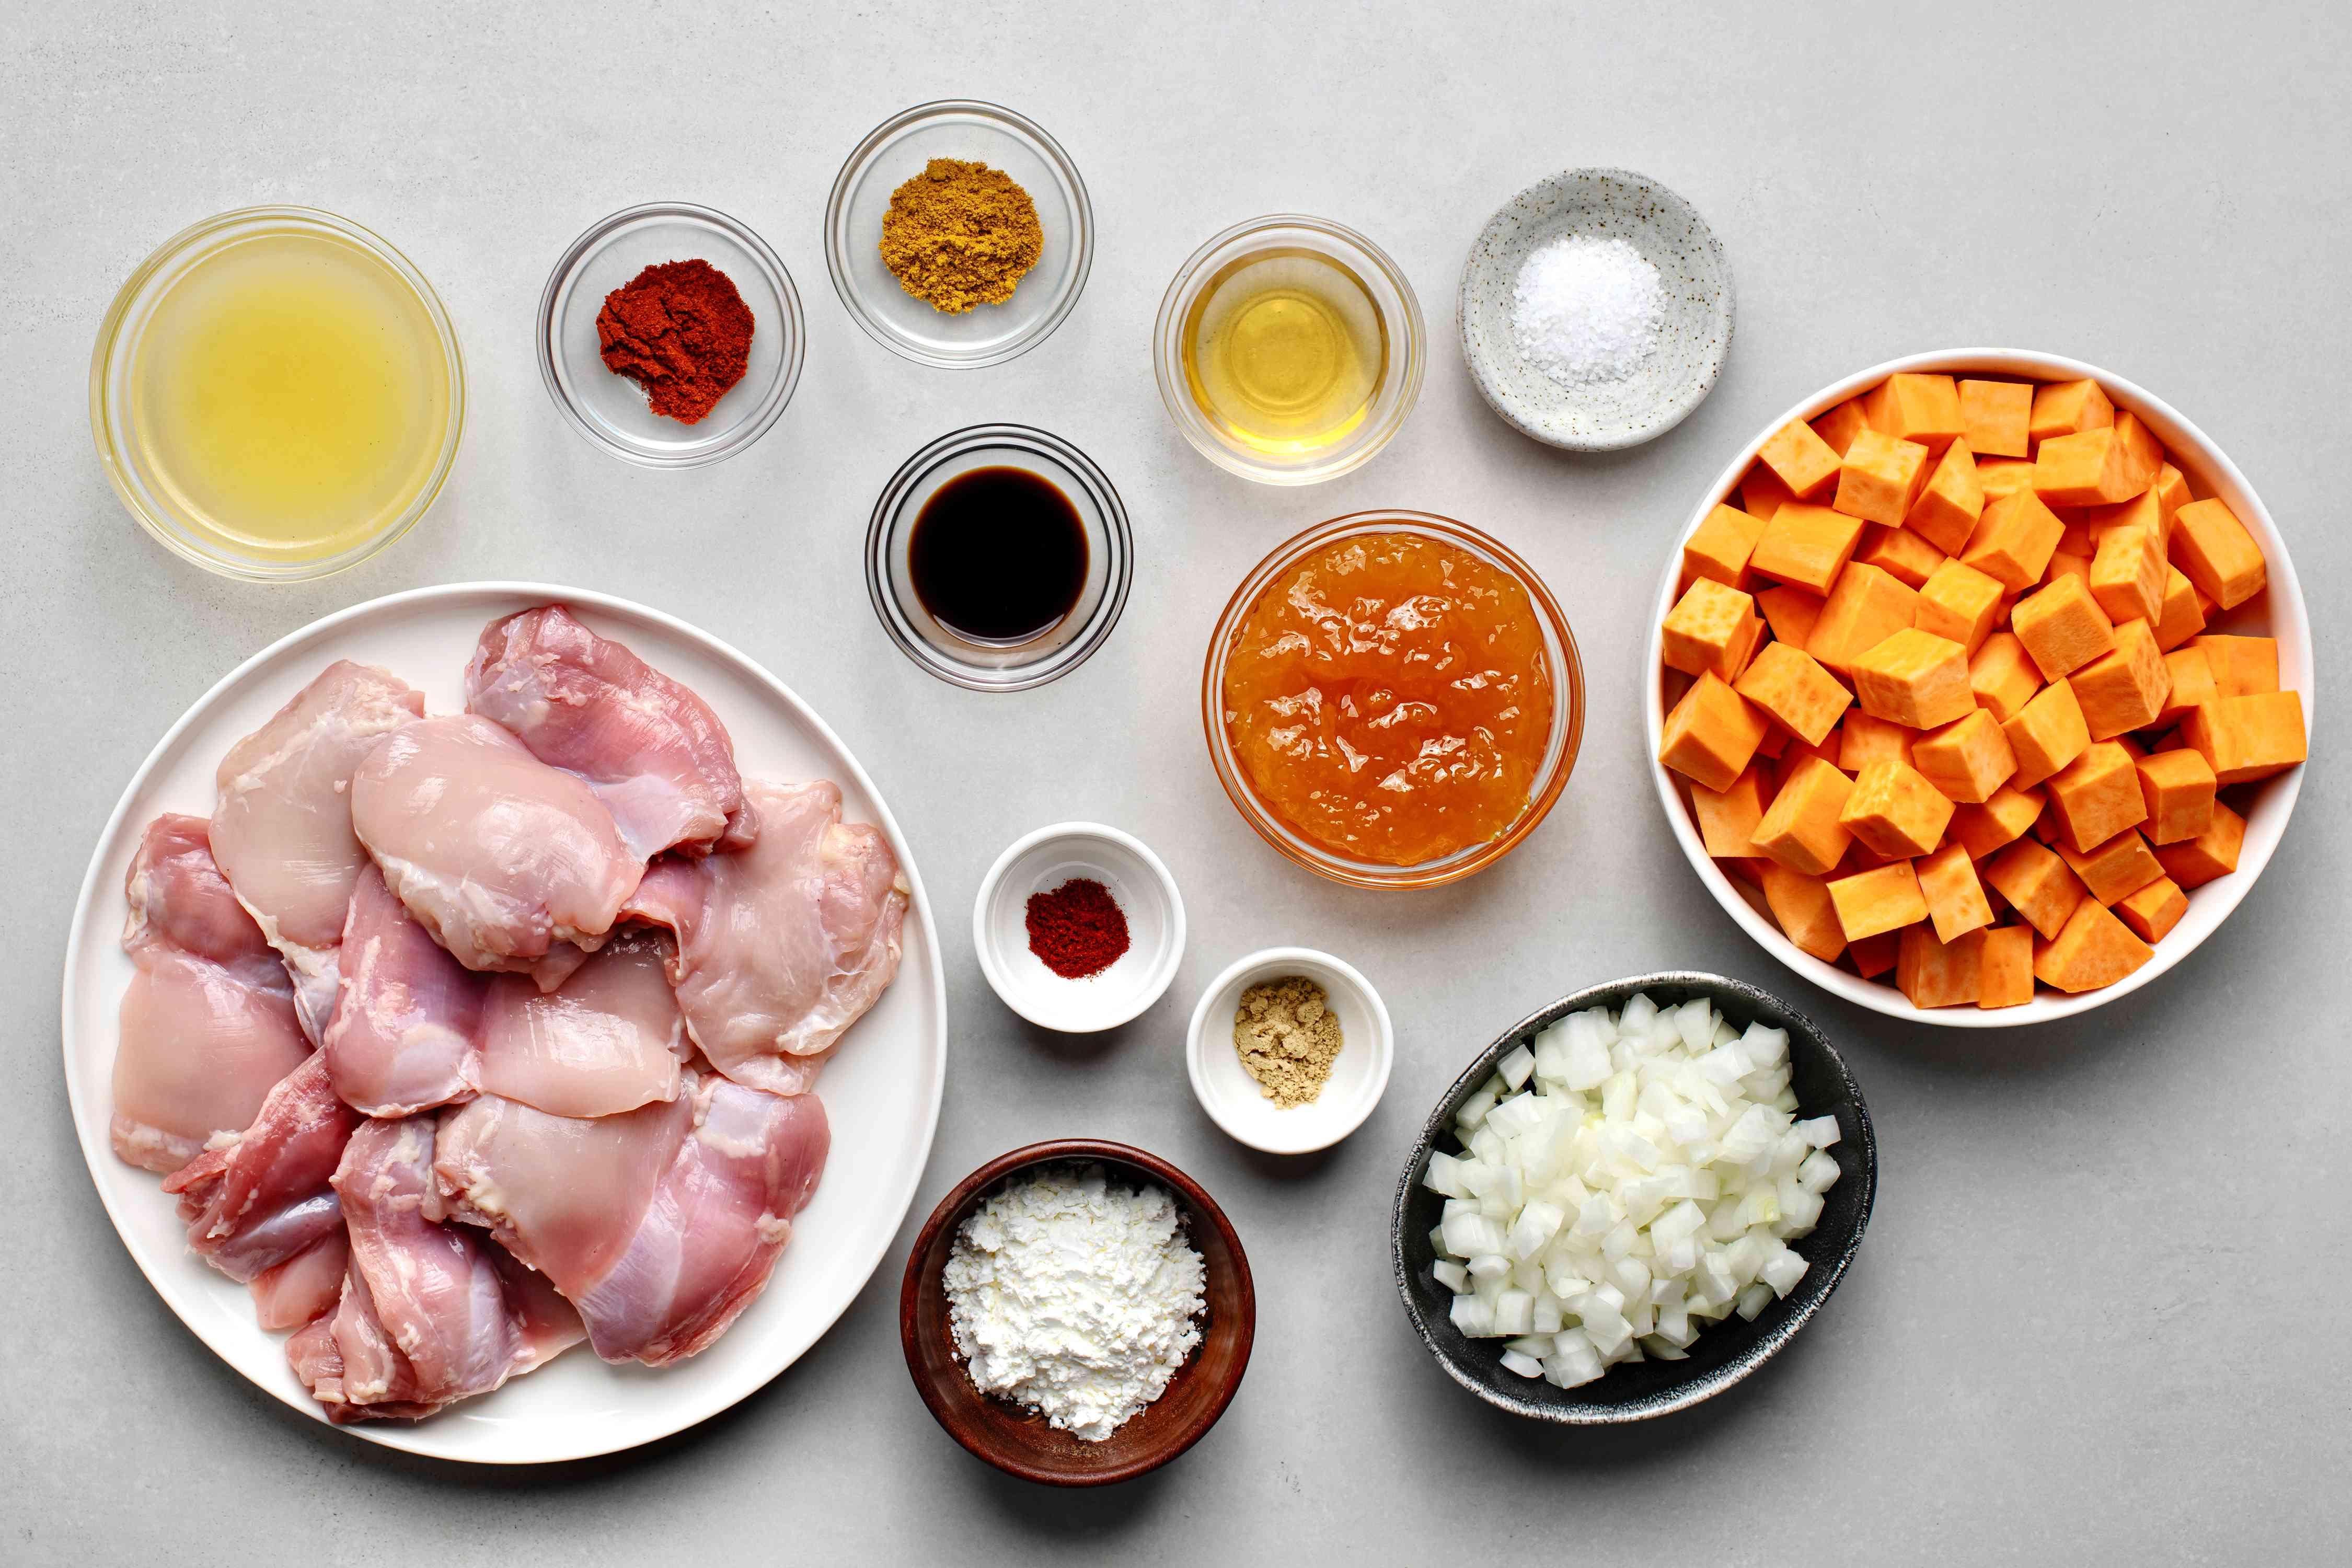 Crockpot Chicken and Sweet Potatoes ingredients